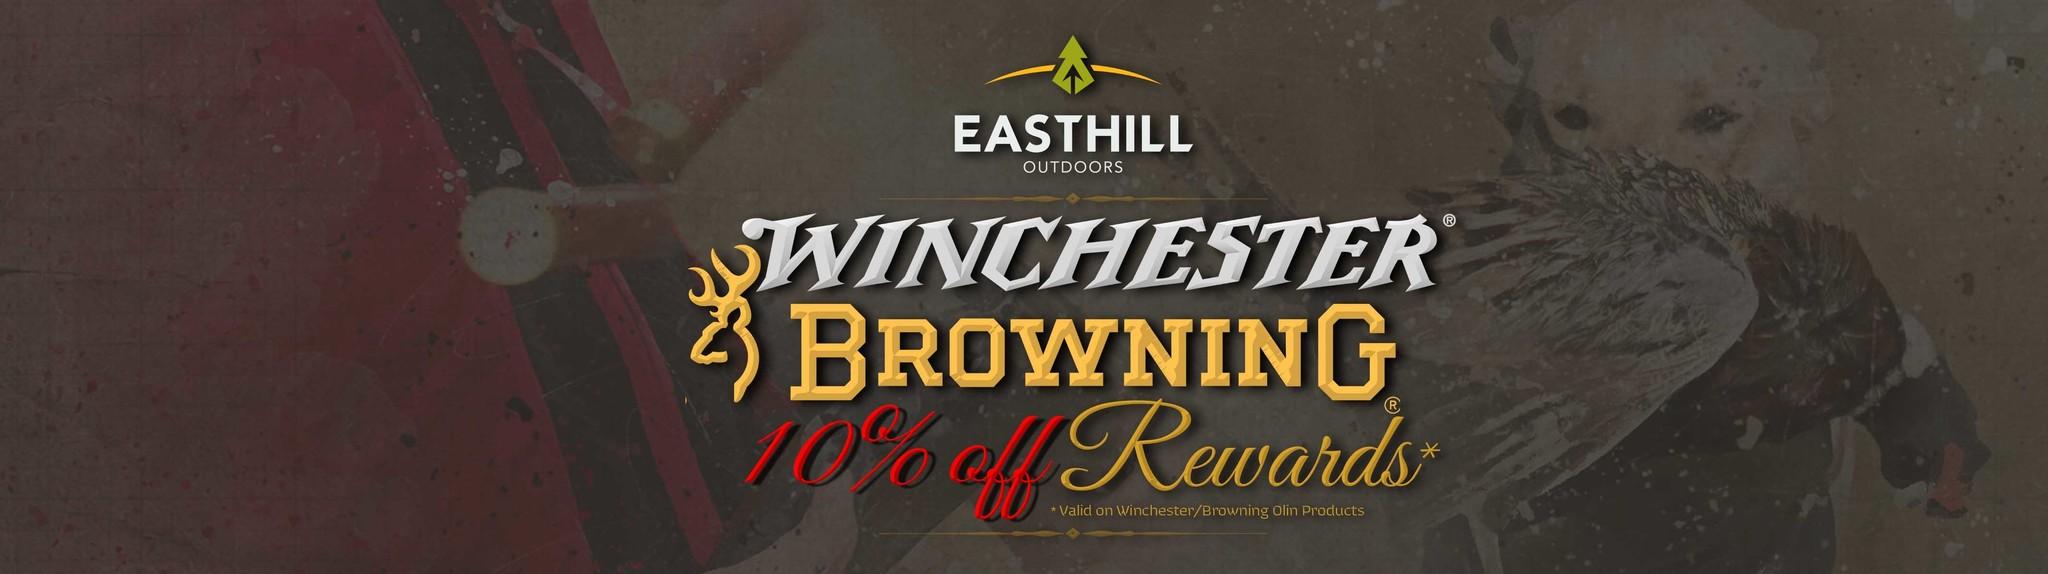 Winchester Browning Rewards